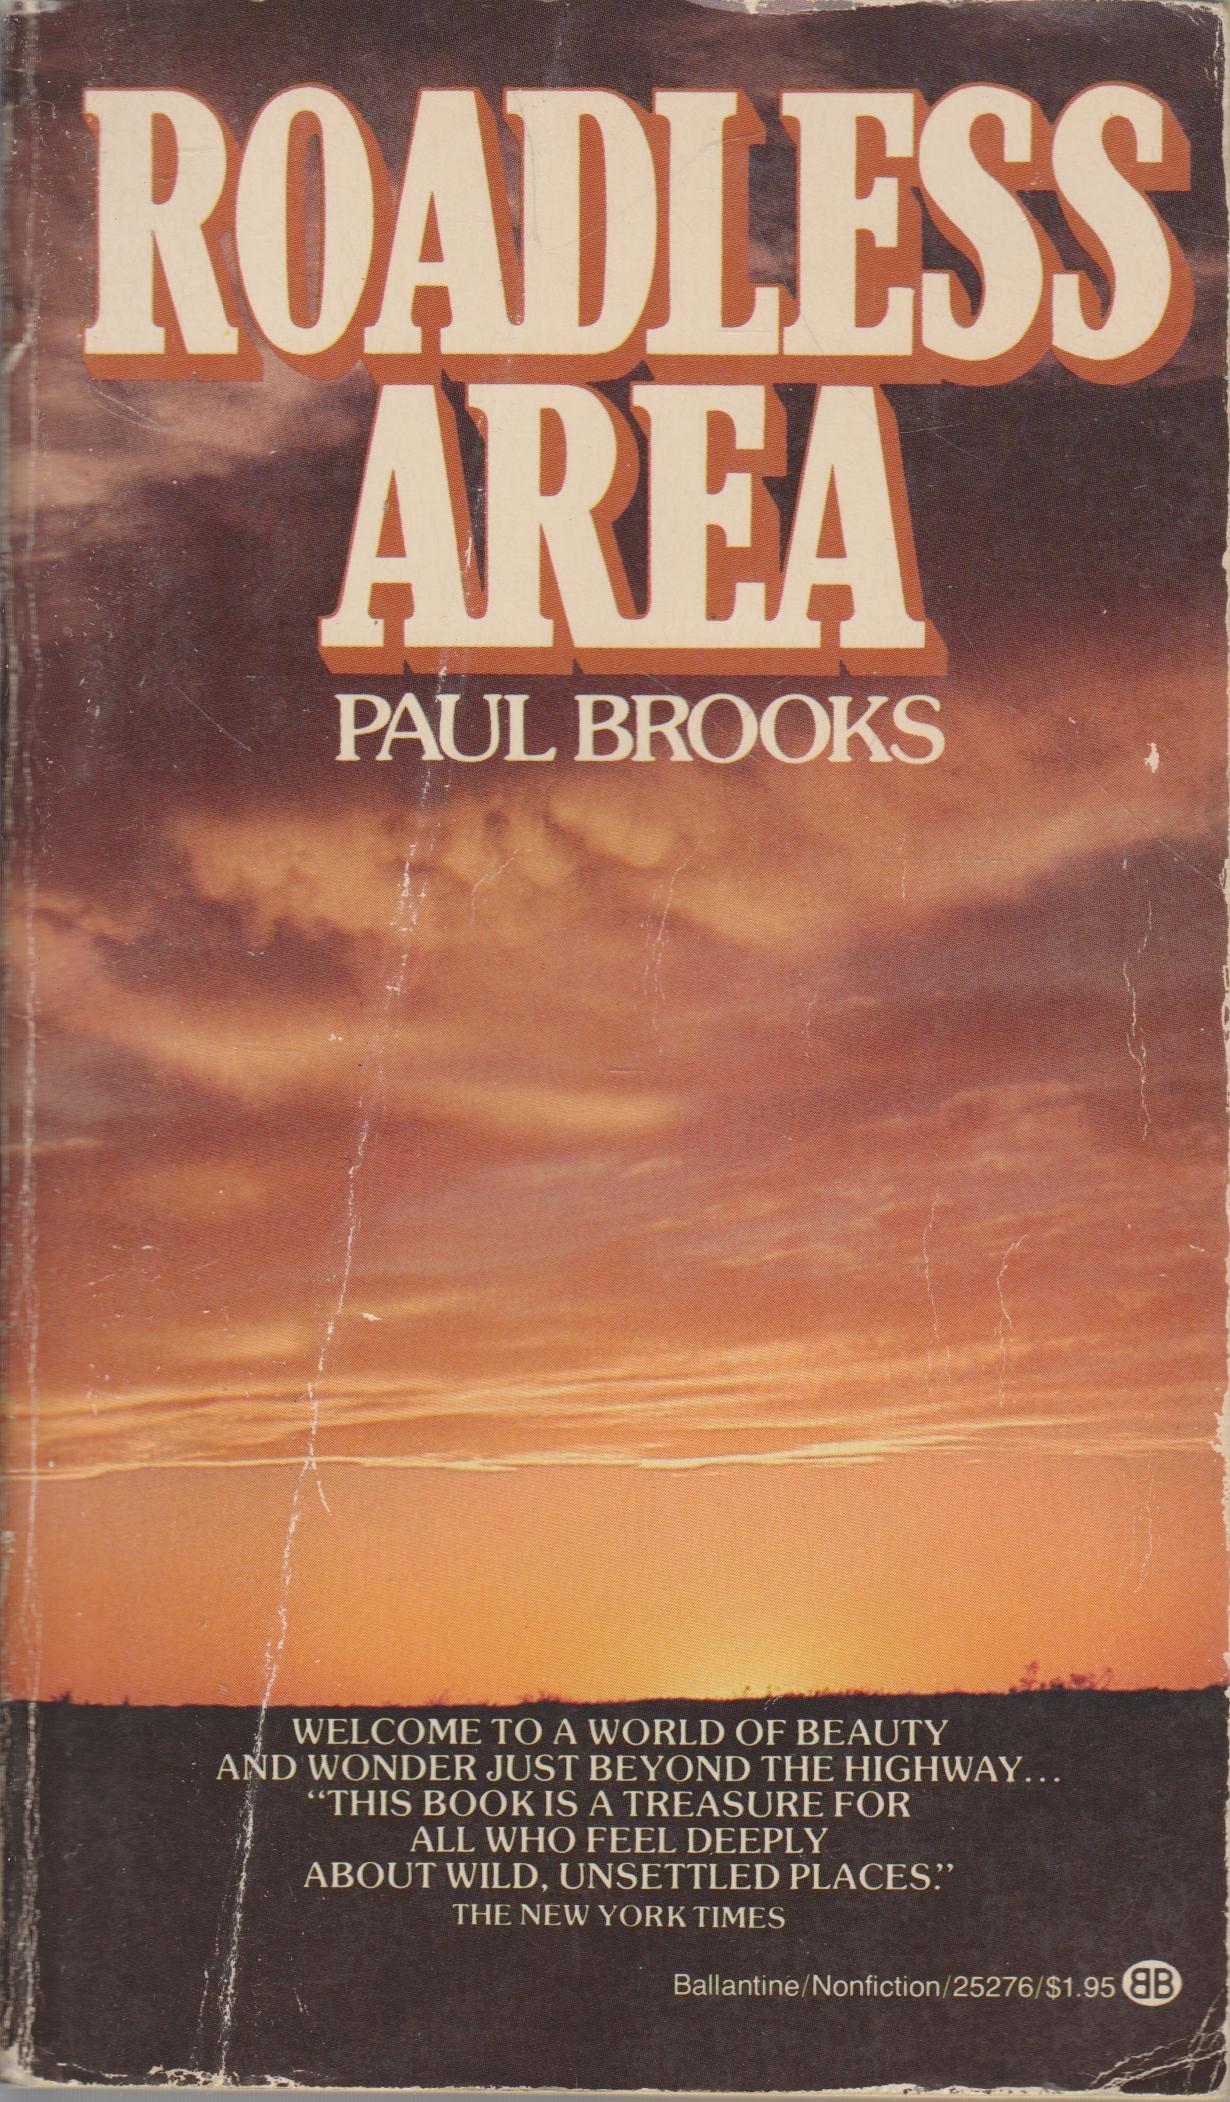 Roadless Area by Paul Brooks